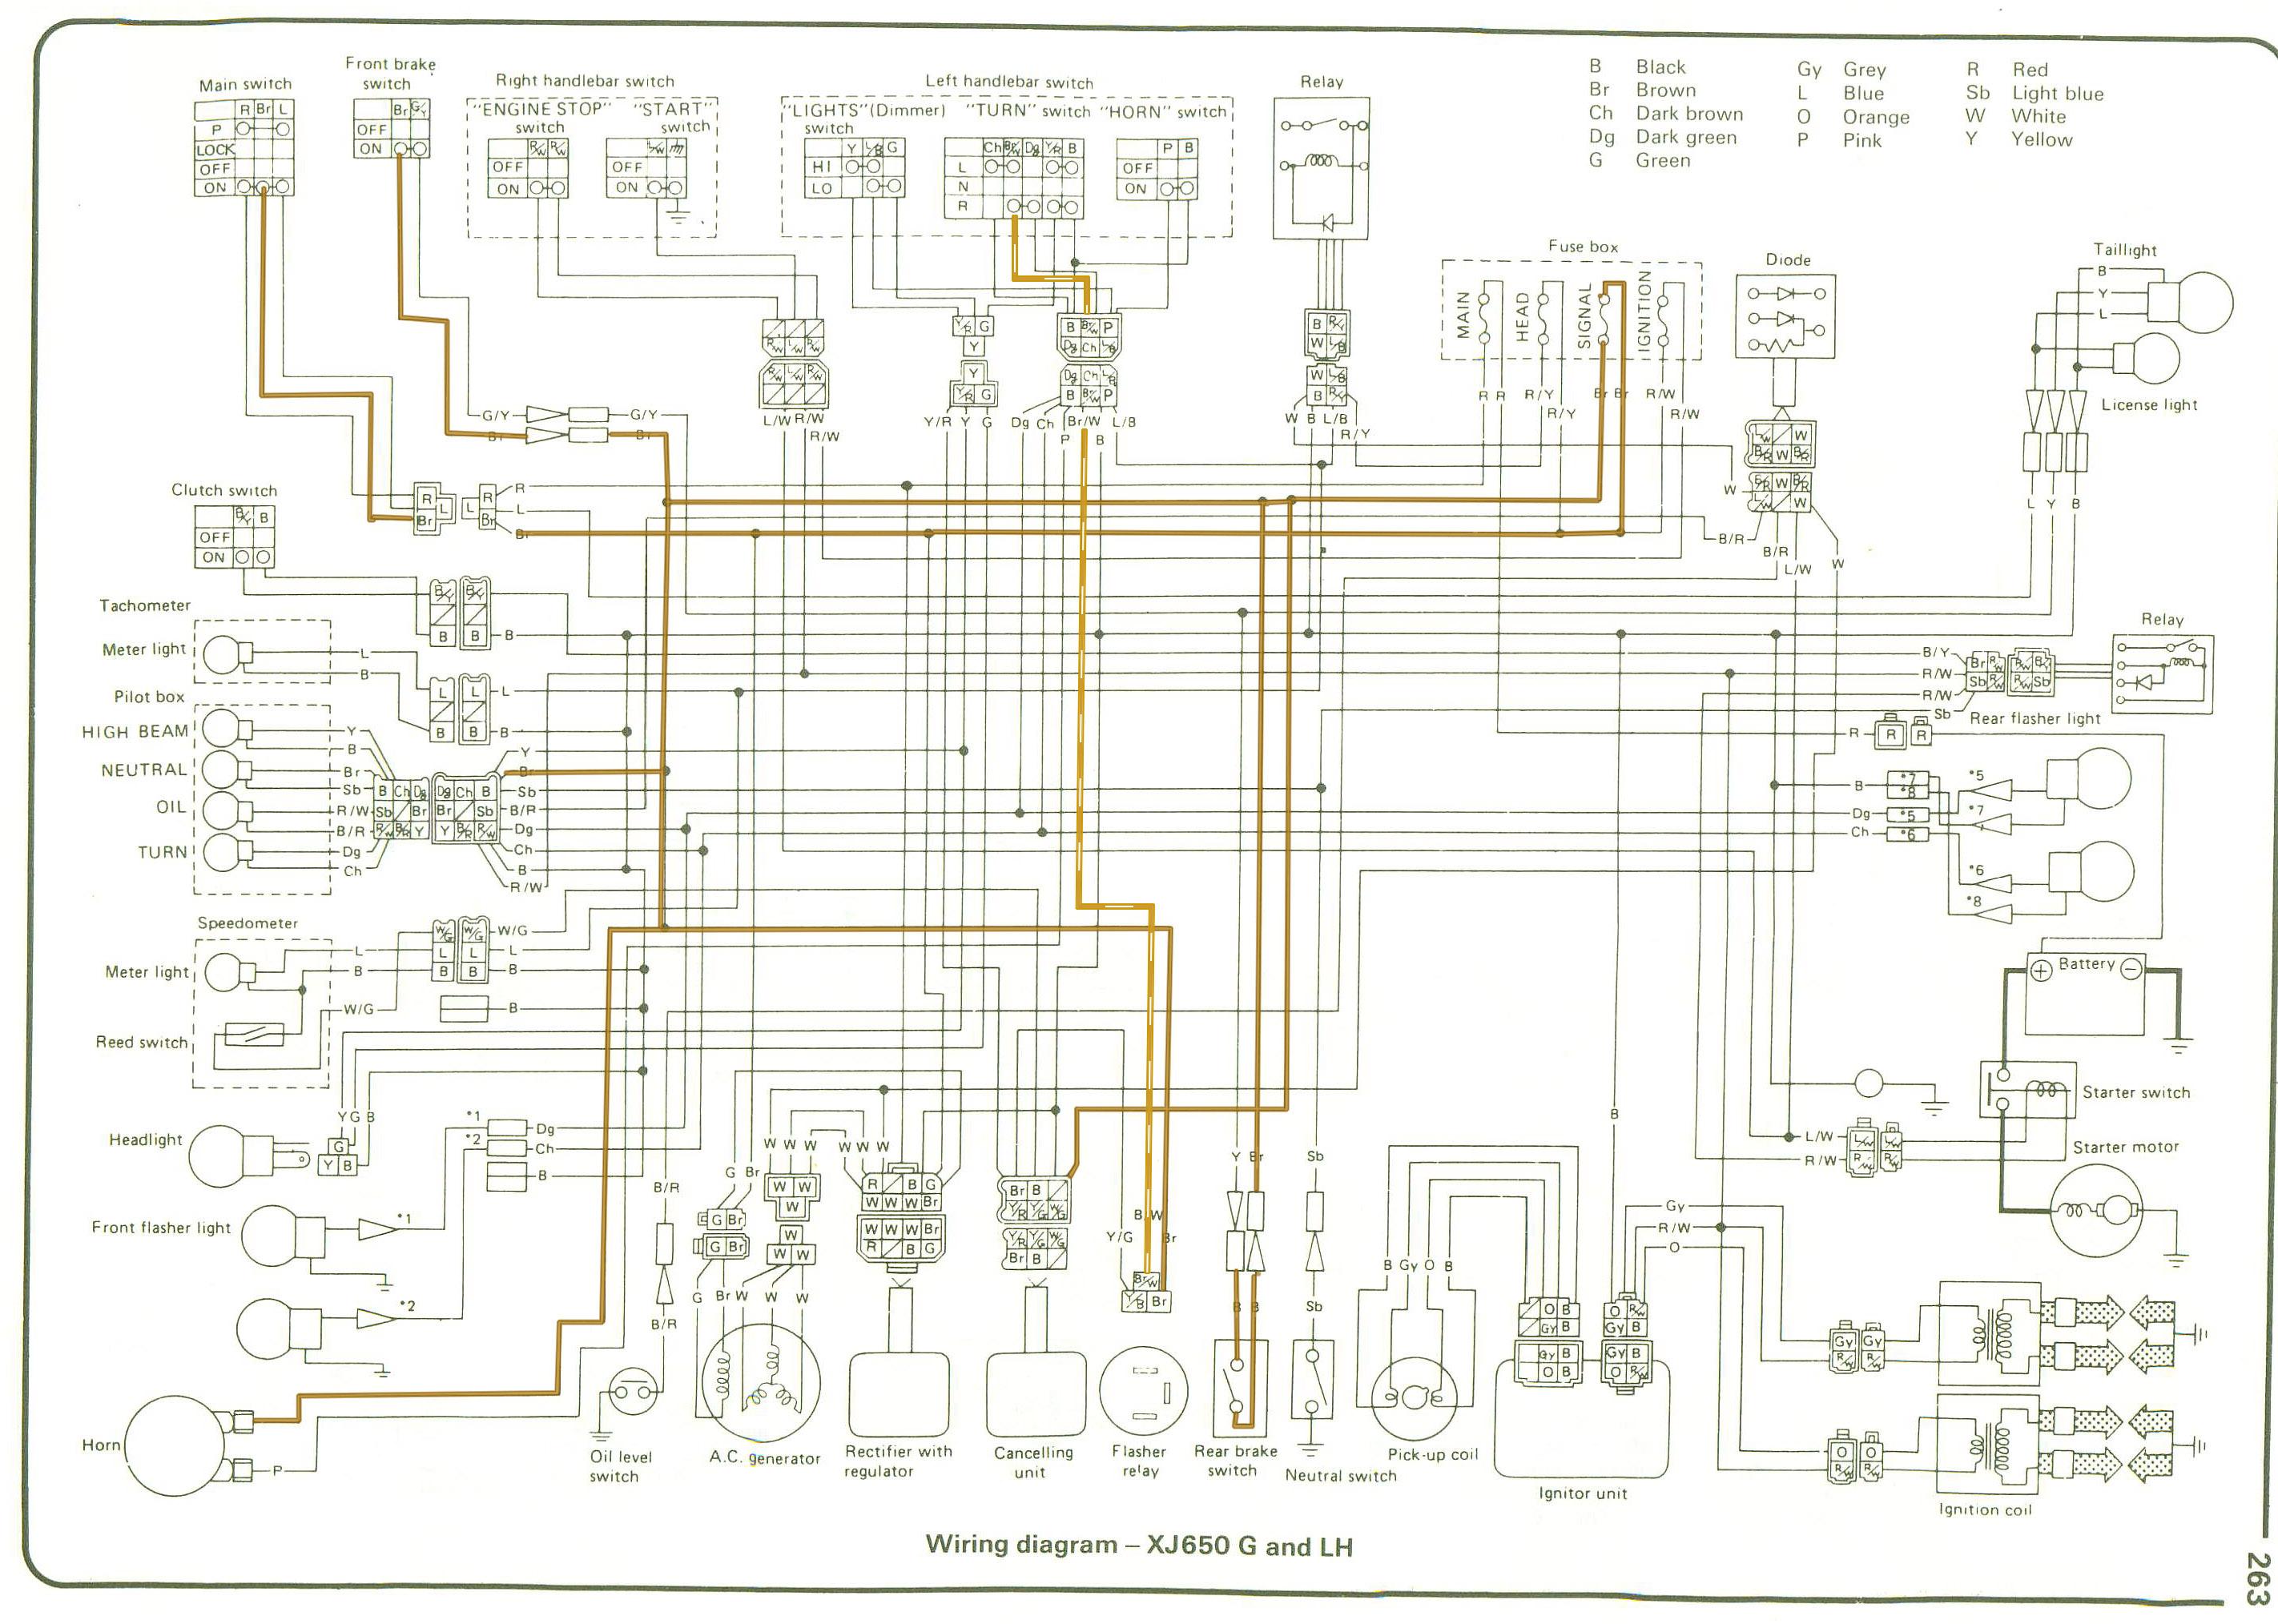 Xs1100 Wiring Diagram on fjr1300 wiring diagram, xj650 wiring diagram, xv535 wiring diagram, xv1000 wiring diagram, xj1100 wiring diagram, xs650 wiring diagram, xj550 wiring diagram, xt350 wiring diagram, tw200 wiring diagram, xvz1300 wiring diagram, rz350 wiring diagram, xs850 wiring diagram, sr500 wiring diagram, pw50 wiring diagram, xj750 wiring diagram, xs400 wiring diagram, it 250 wiring diagram, yzf r6 wiring diagram, virago wiring diagram, yamaha wiring diagram,